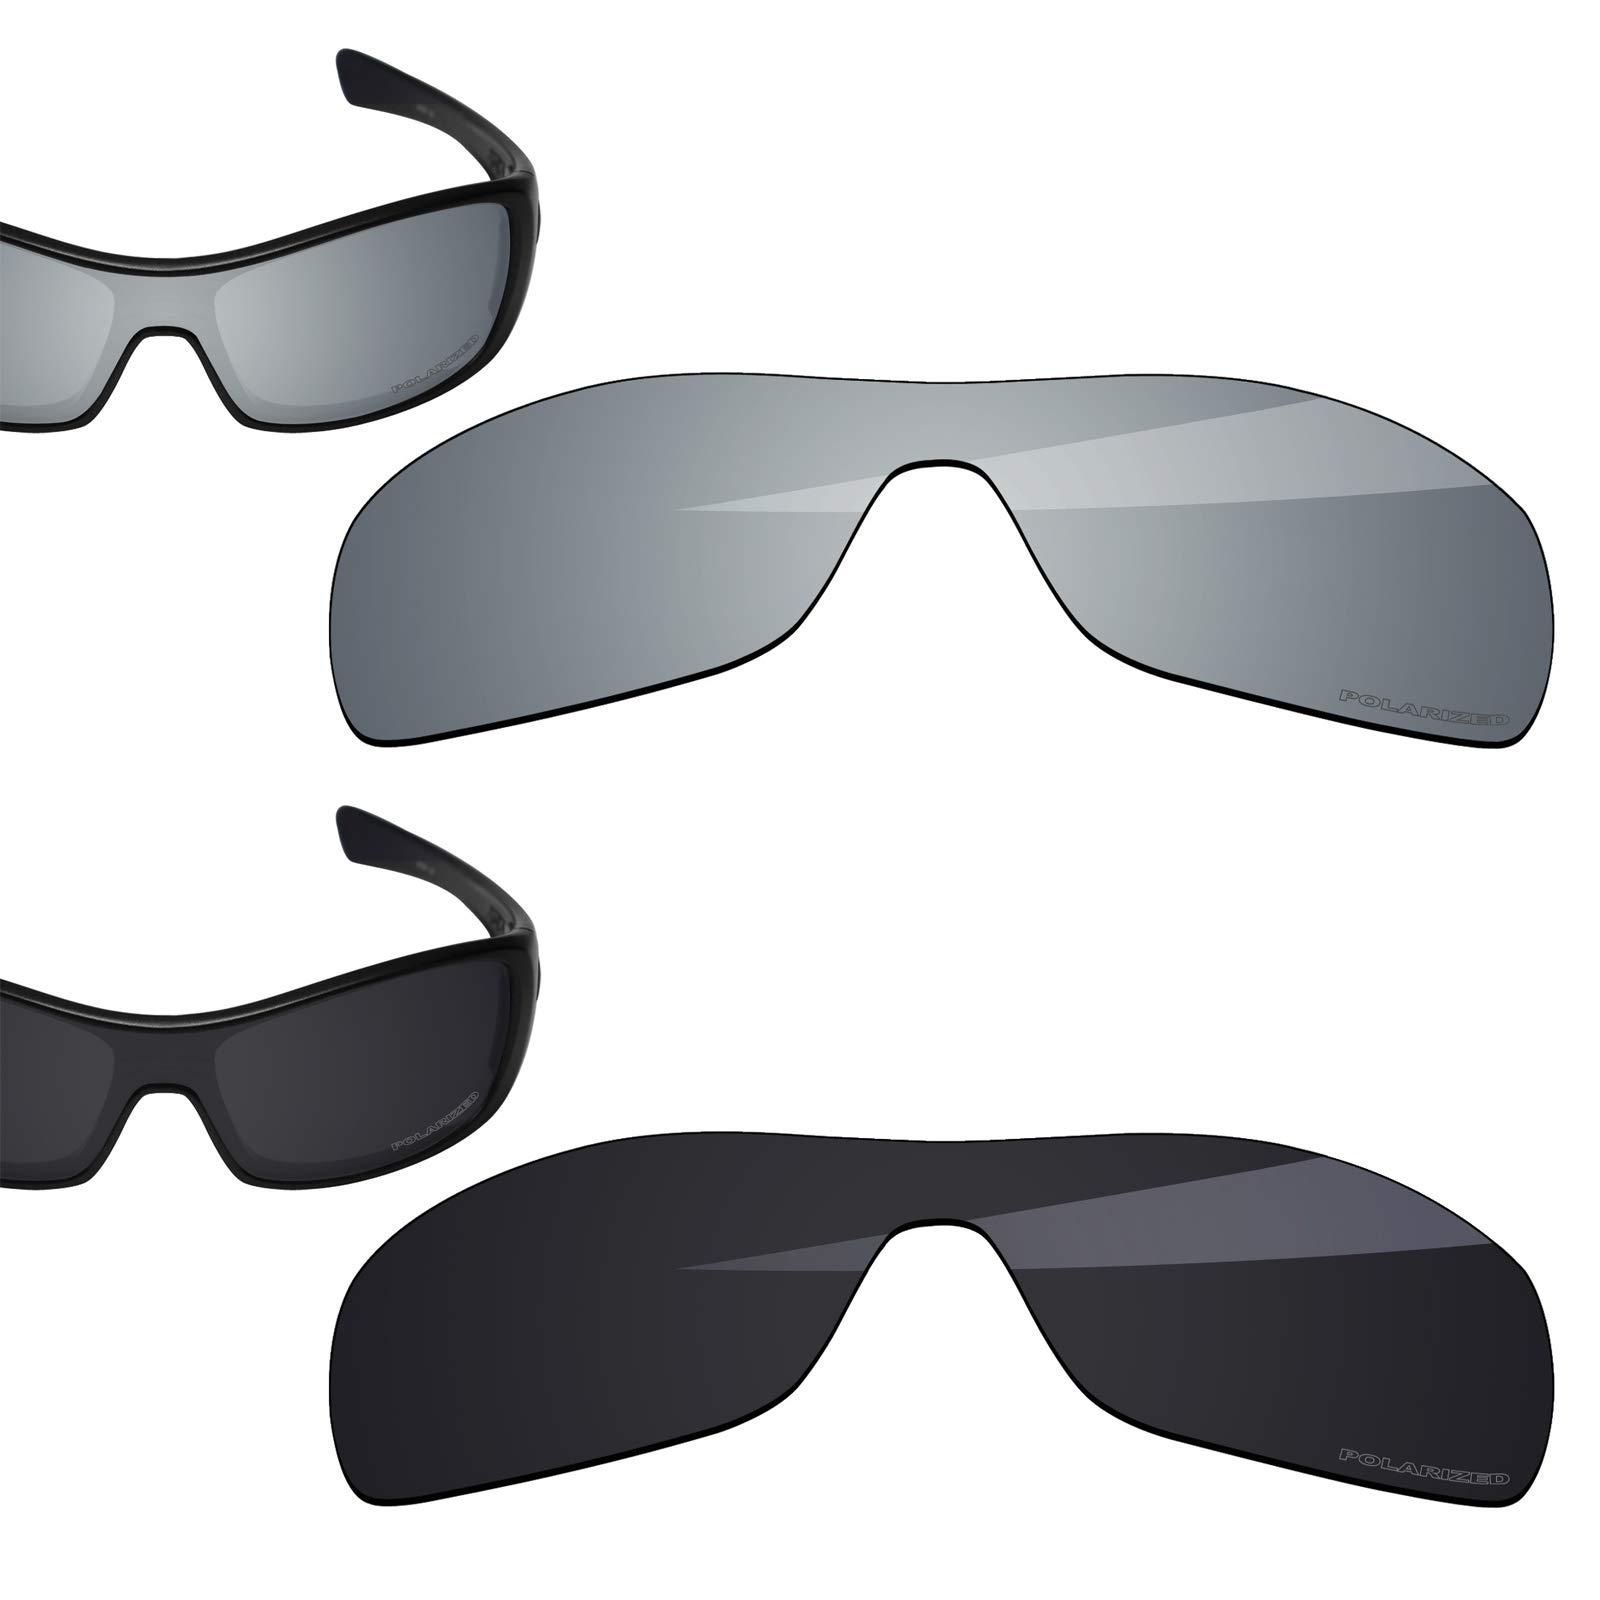 BlazerBuck Anti-salt Polarized Replacement Lenses for Oakley Antix - Black & Silver Chrome